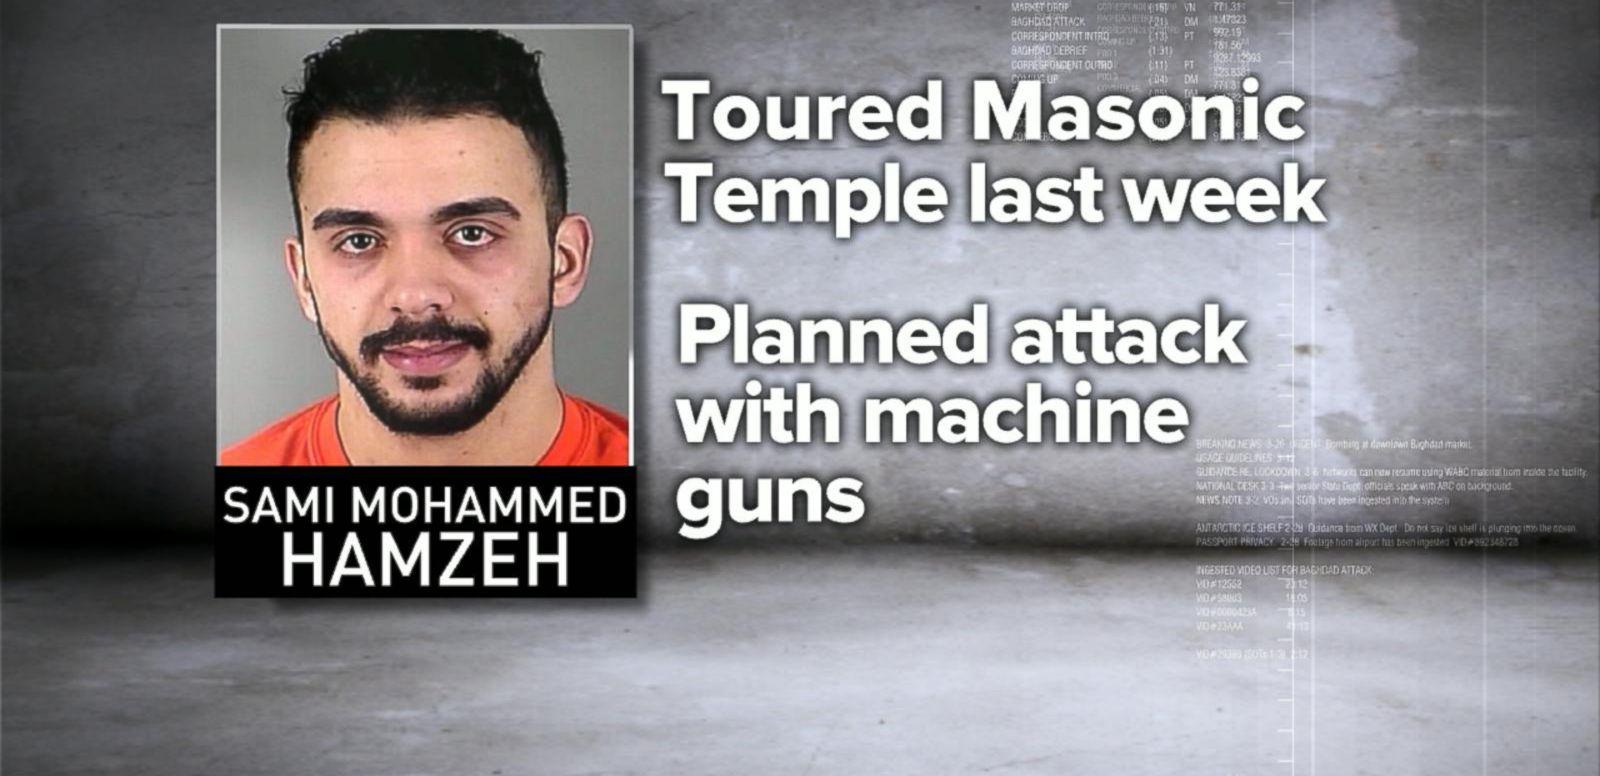 VIDEO: FBI Thwarts Terror Plot Against Masonic Temple in Wisconsin